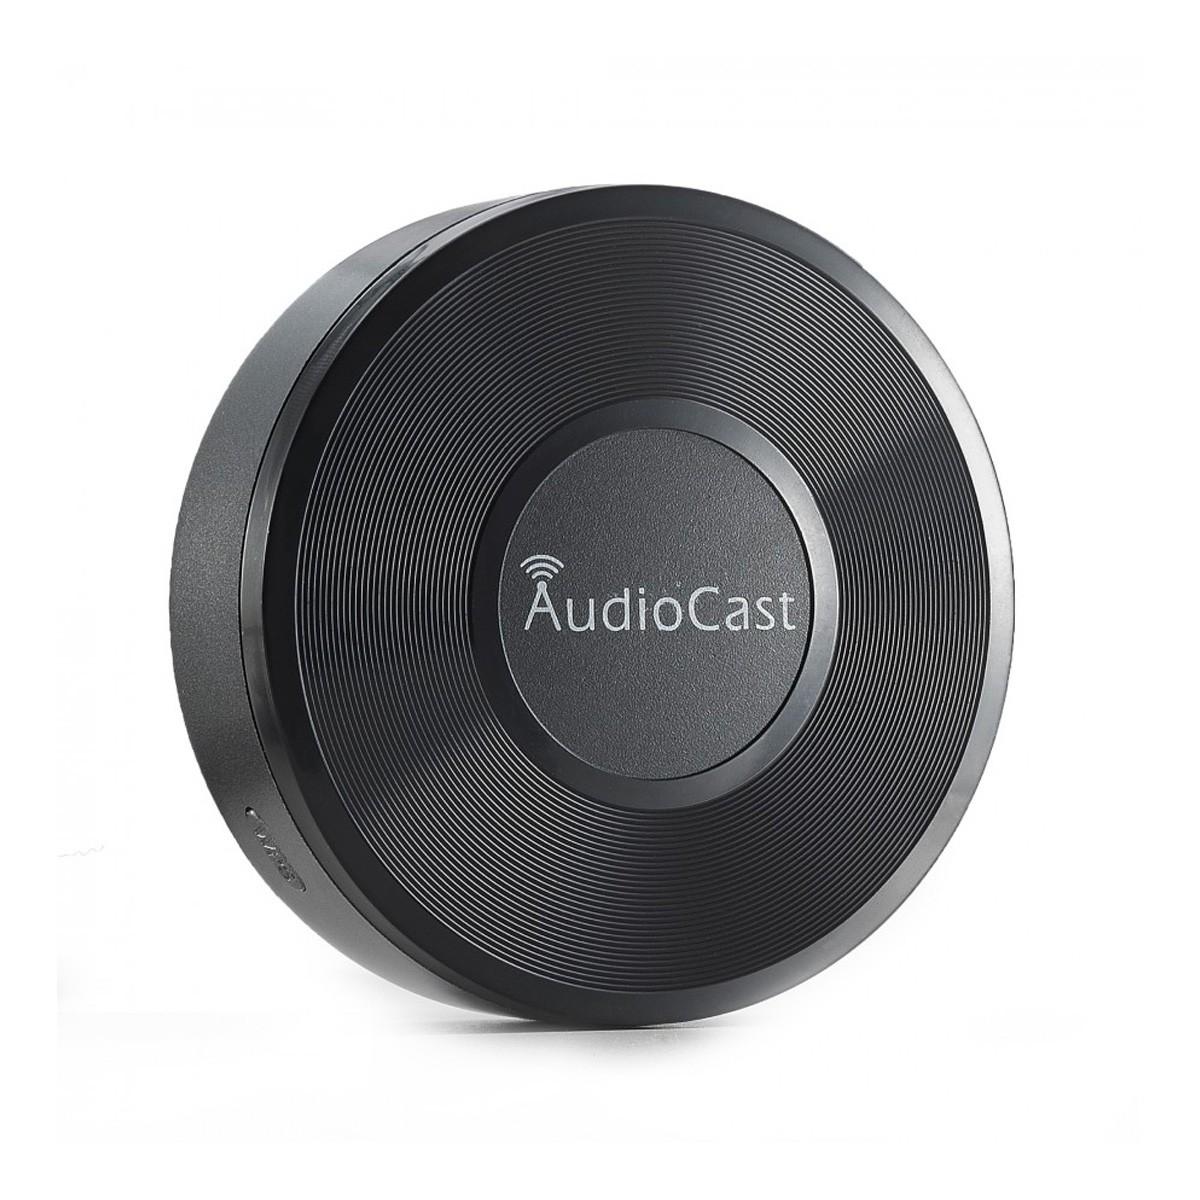 iEAST AUDIOCAST M5 Récepteur Audio Wifi Multiroom DLNA Airplay